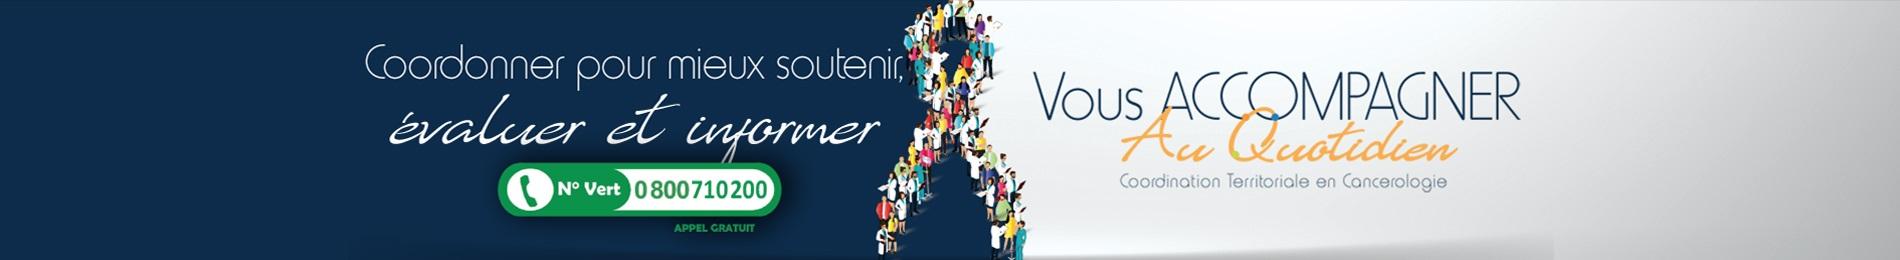 Contact ACTC nos services bandeau image